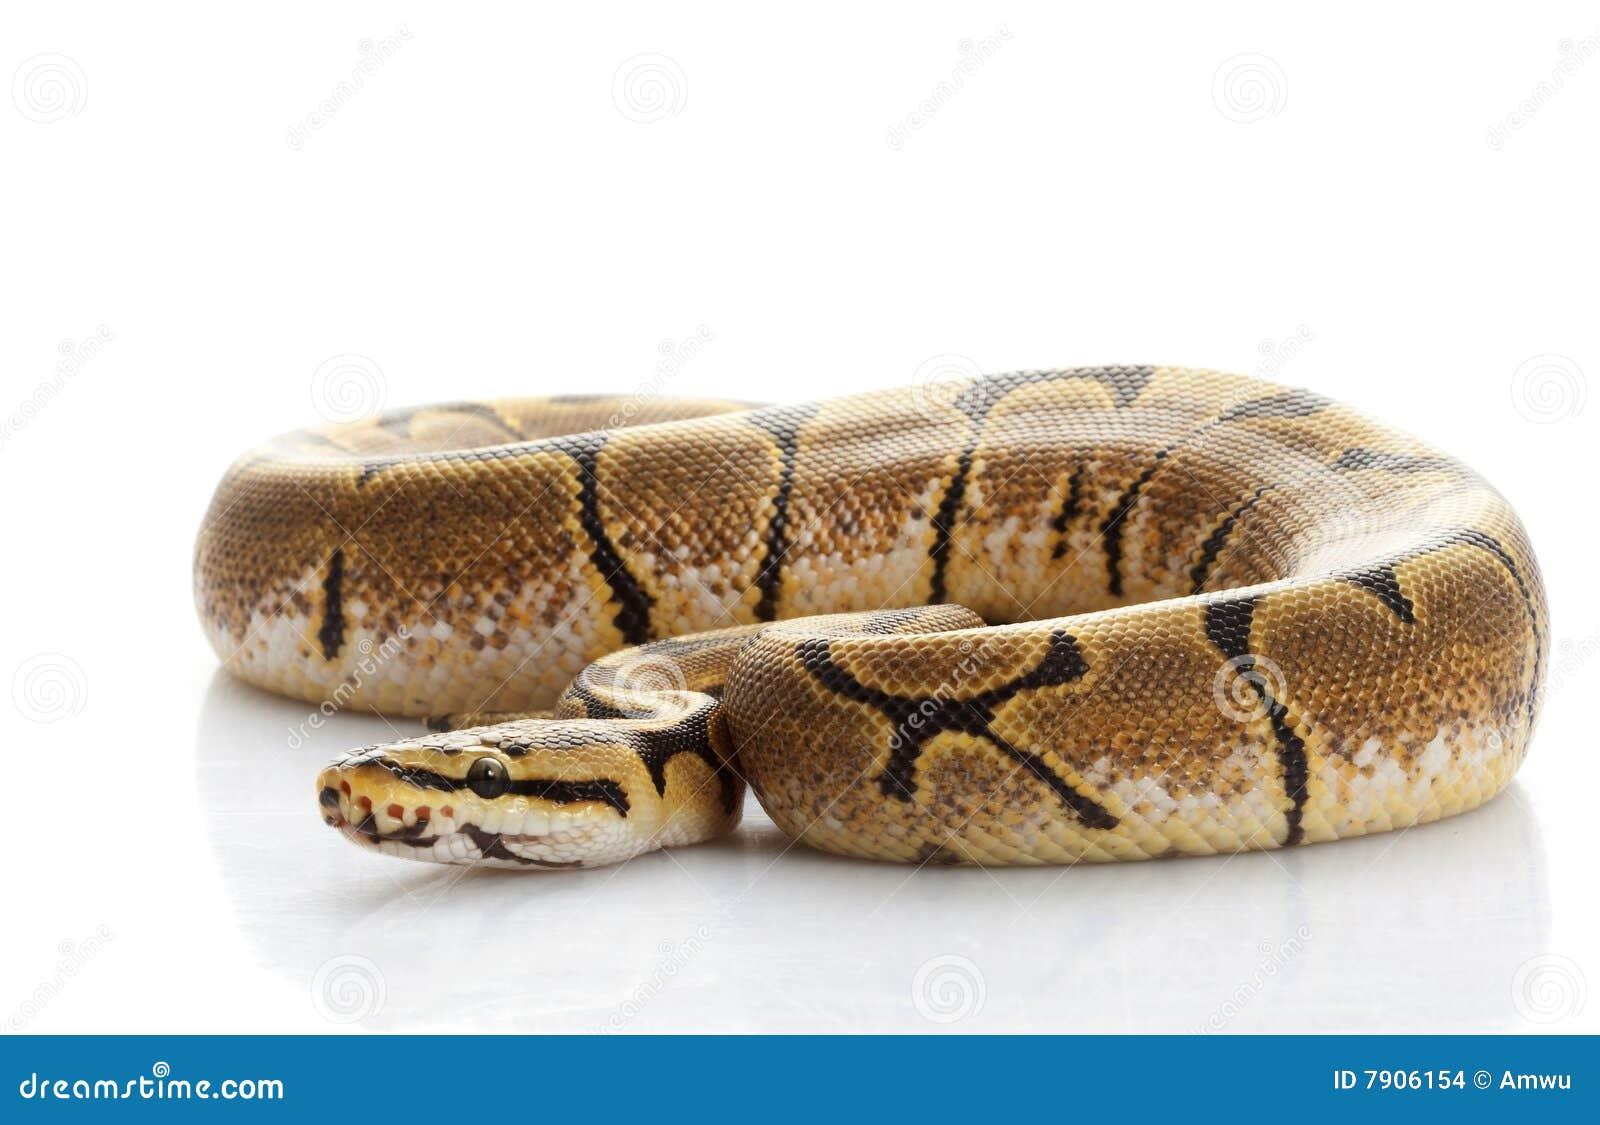 Spider Ball Python (Python regius) isolated on white background.